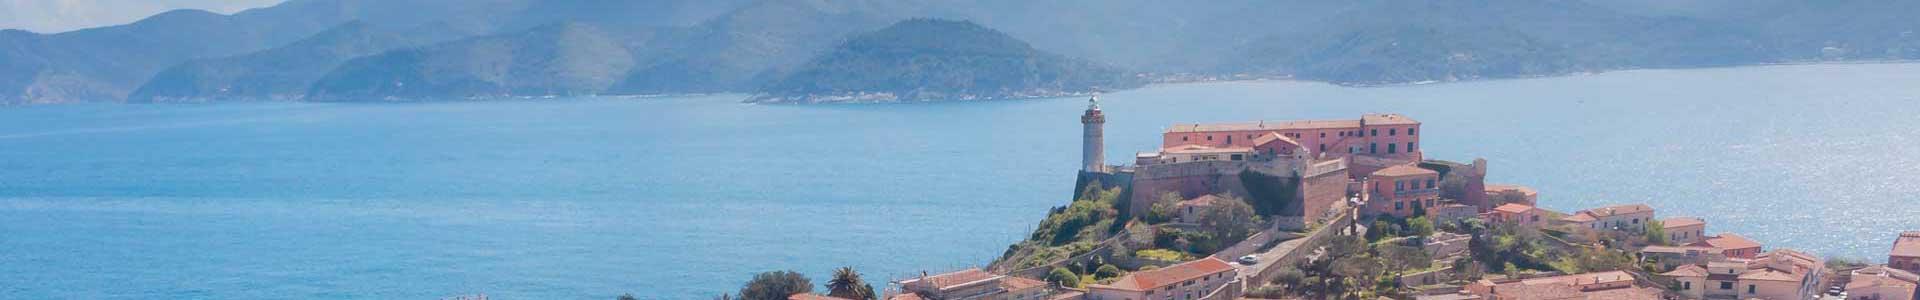 Pelagos Elba